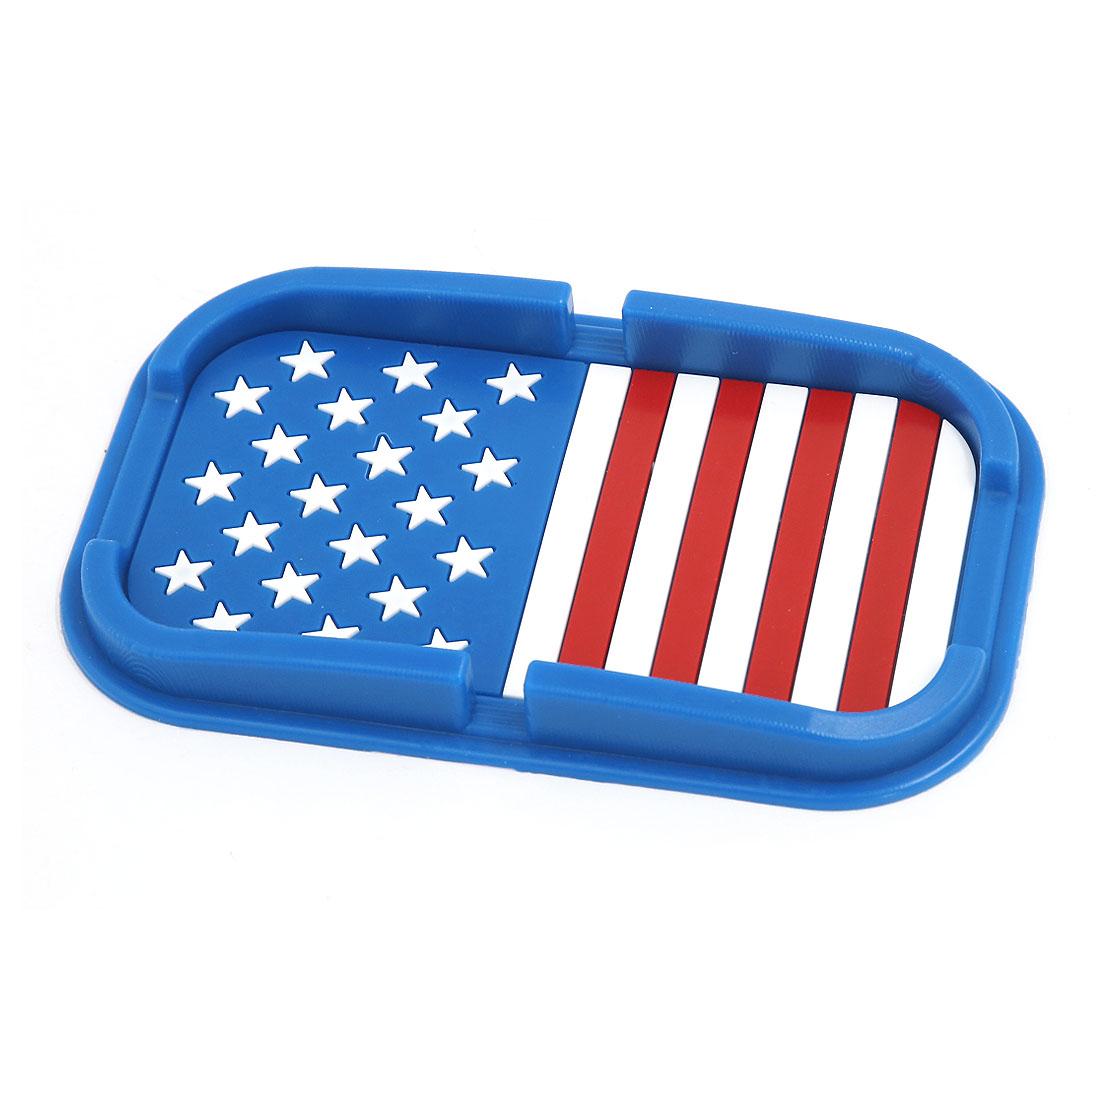 Automobile Navigation Blue Rubber Star Stripe Pattern Non-Slip Pad Mat Holder